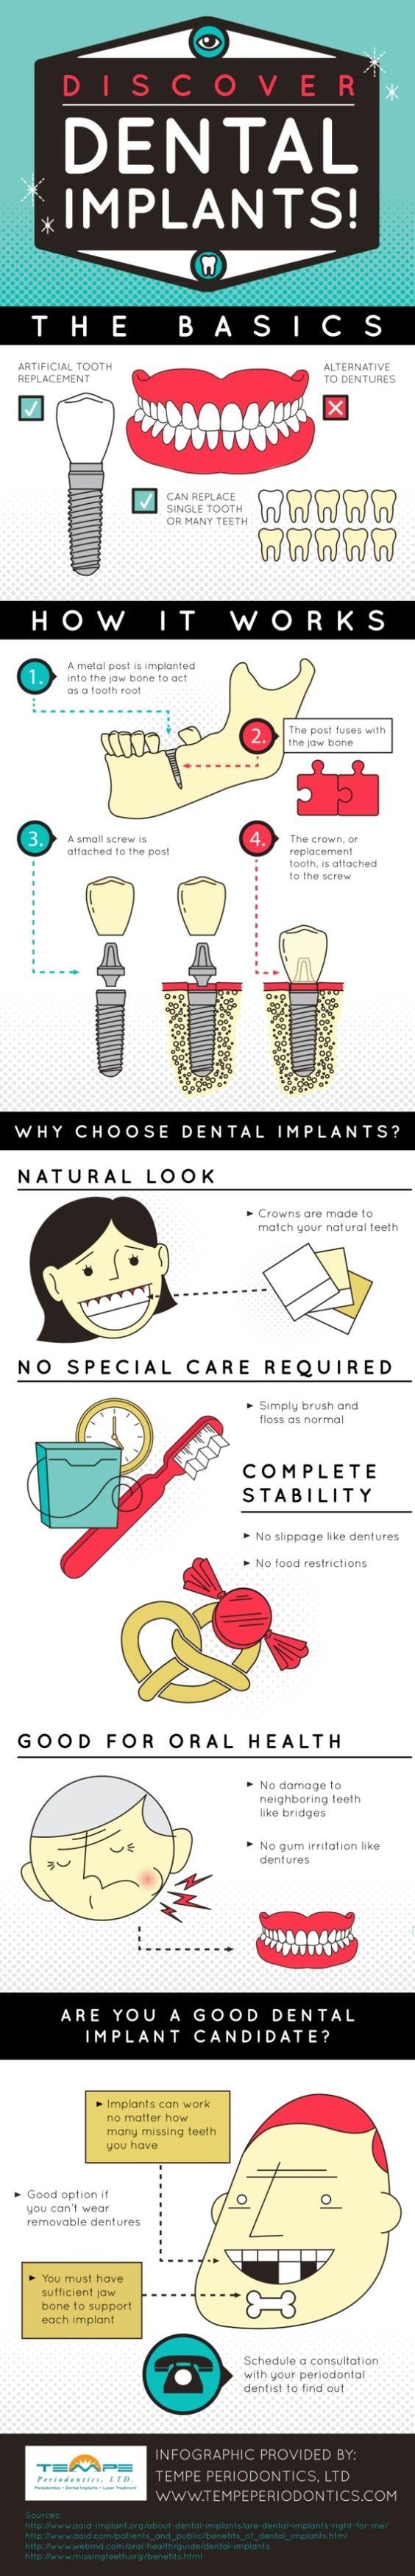 discover dental implants